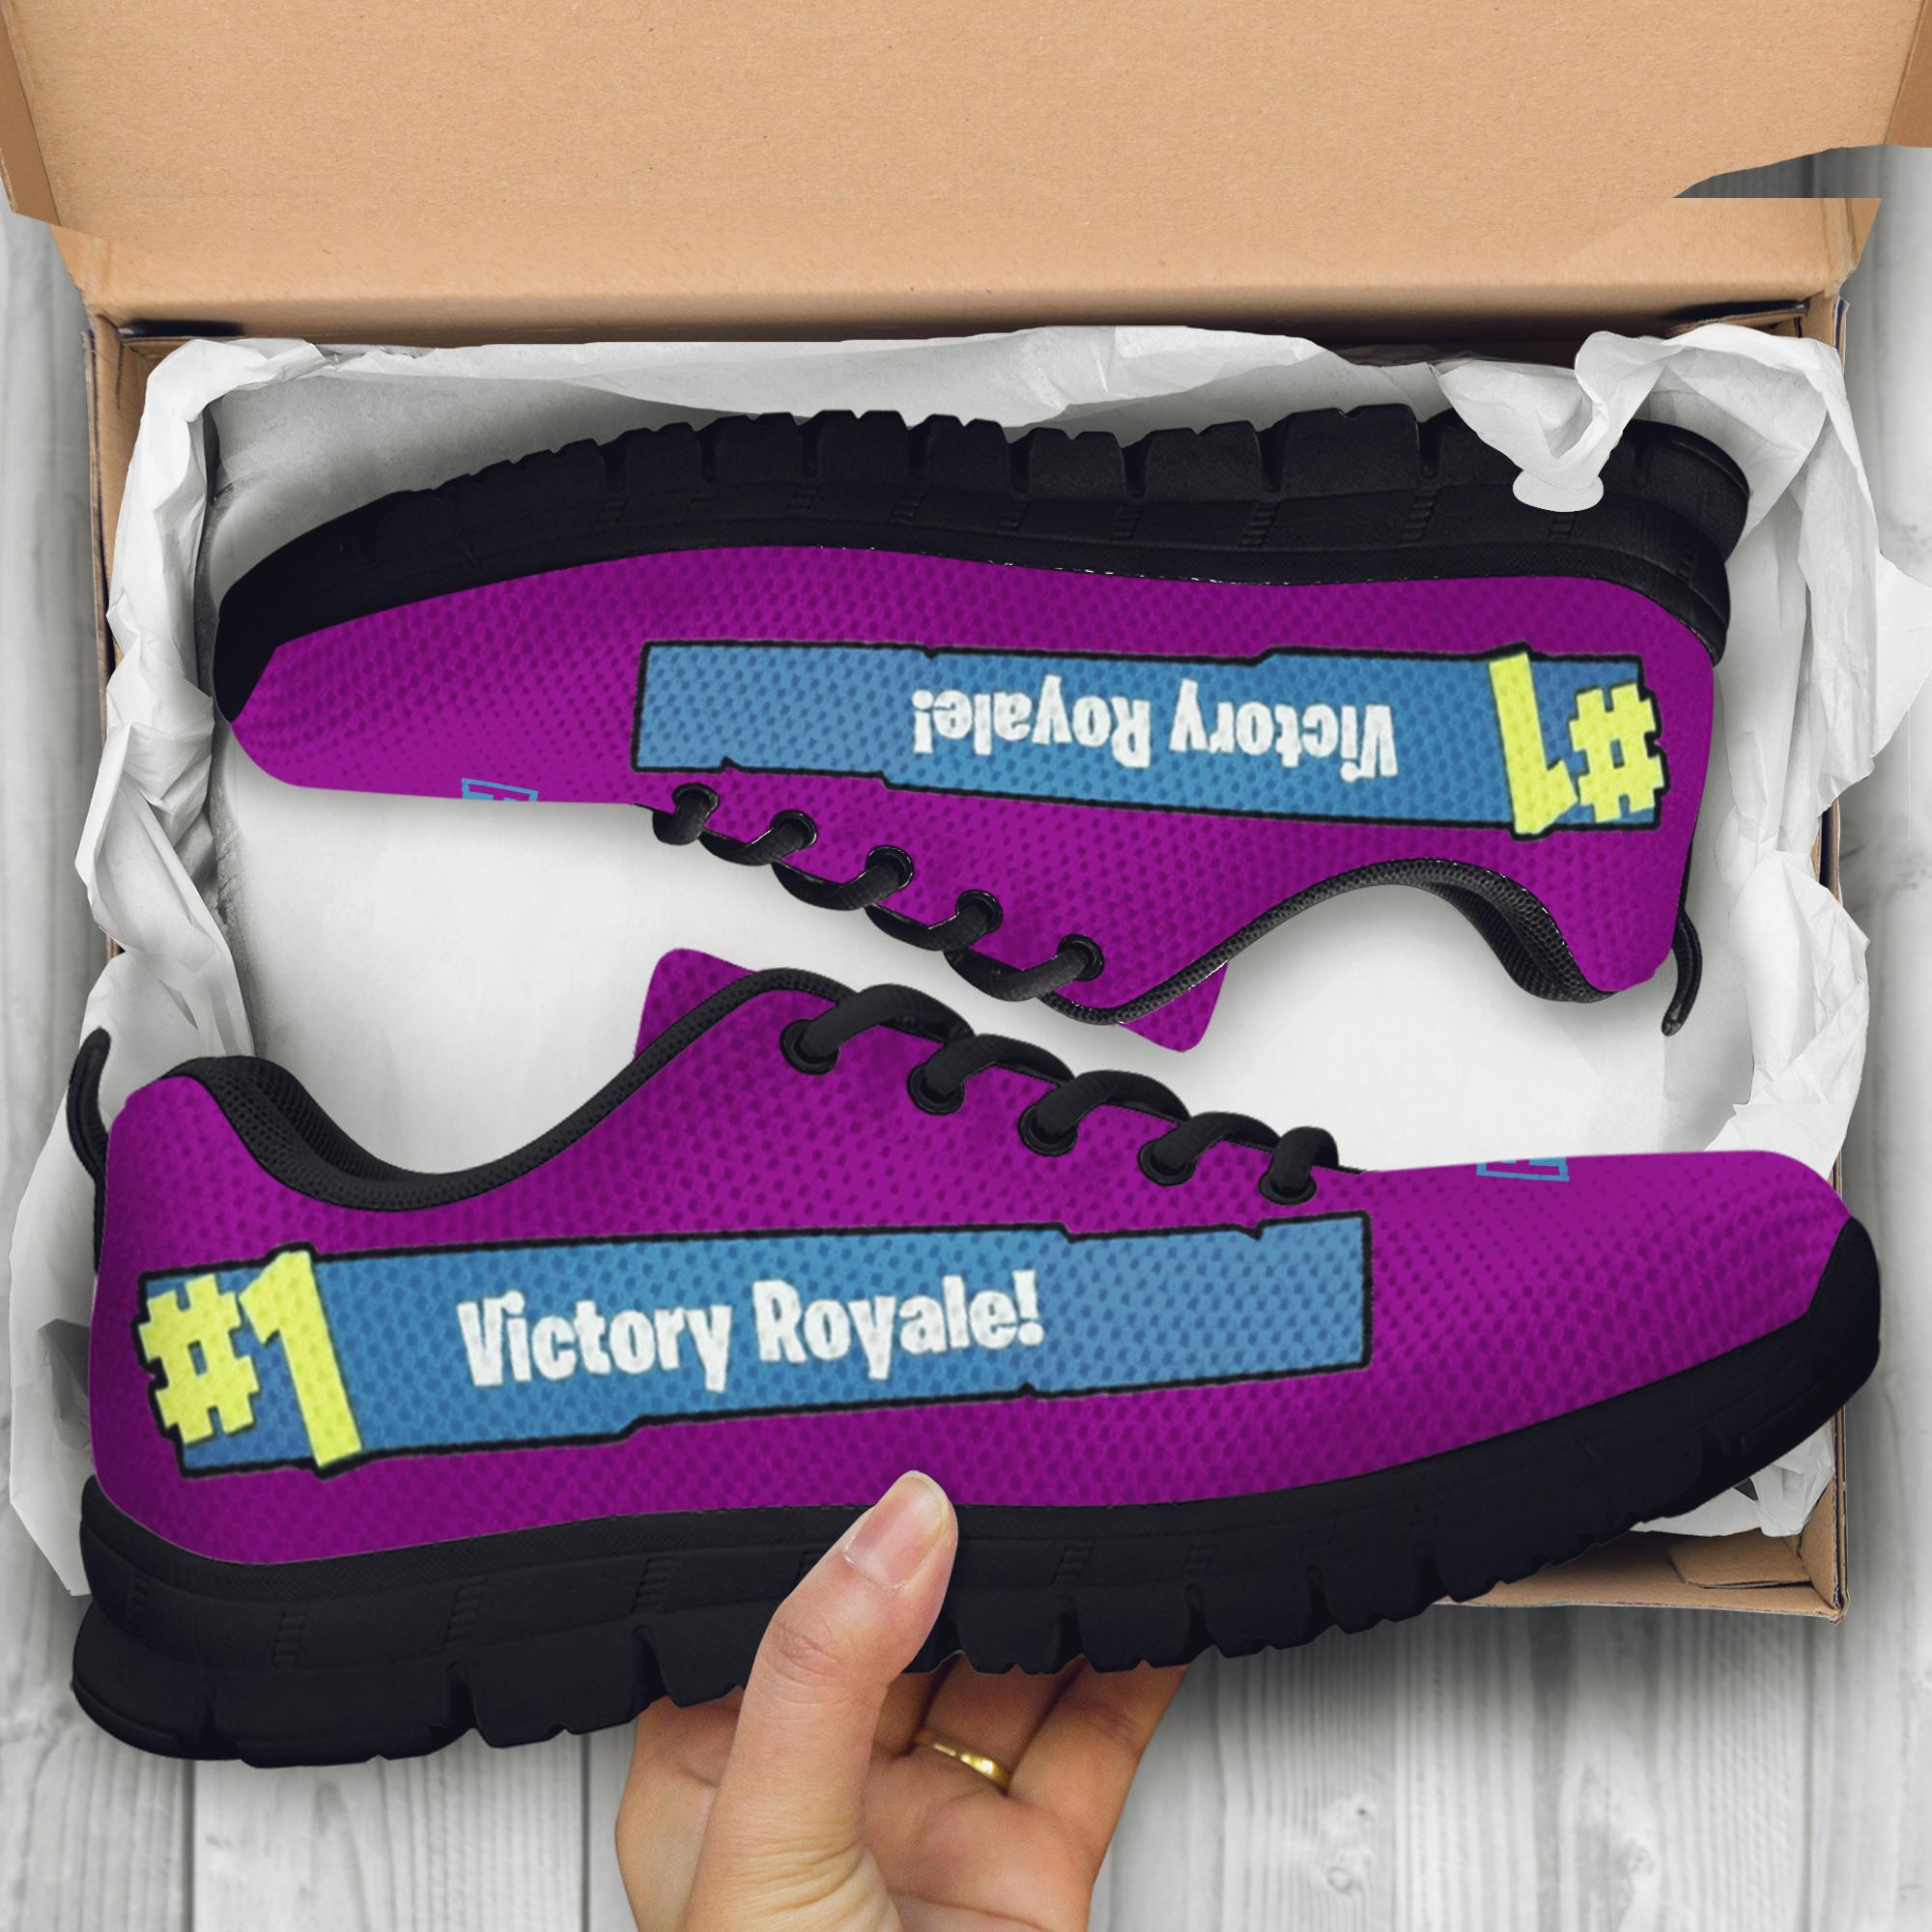 077d91c054b3 Fortnite Battle Royale Custom Shoes sneakers trainers - ladies